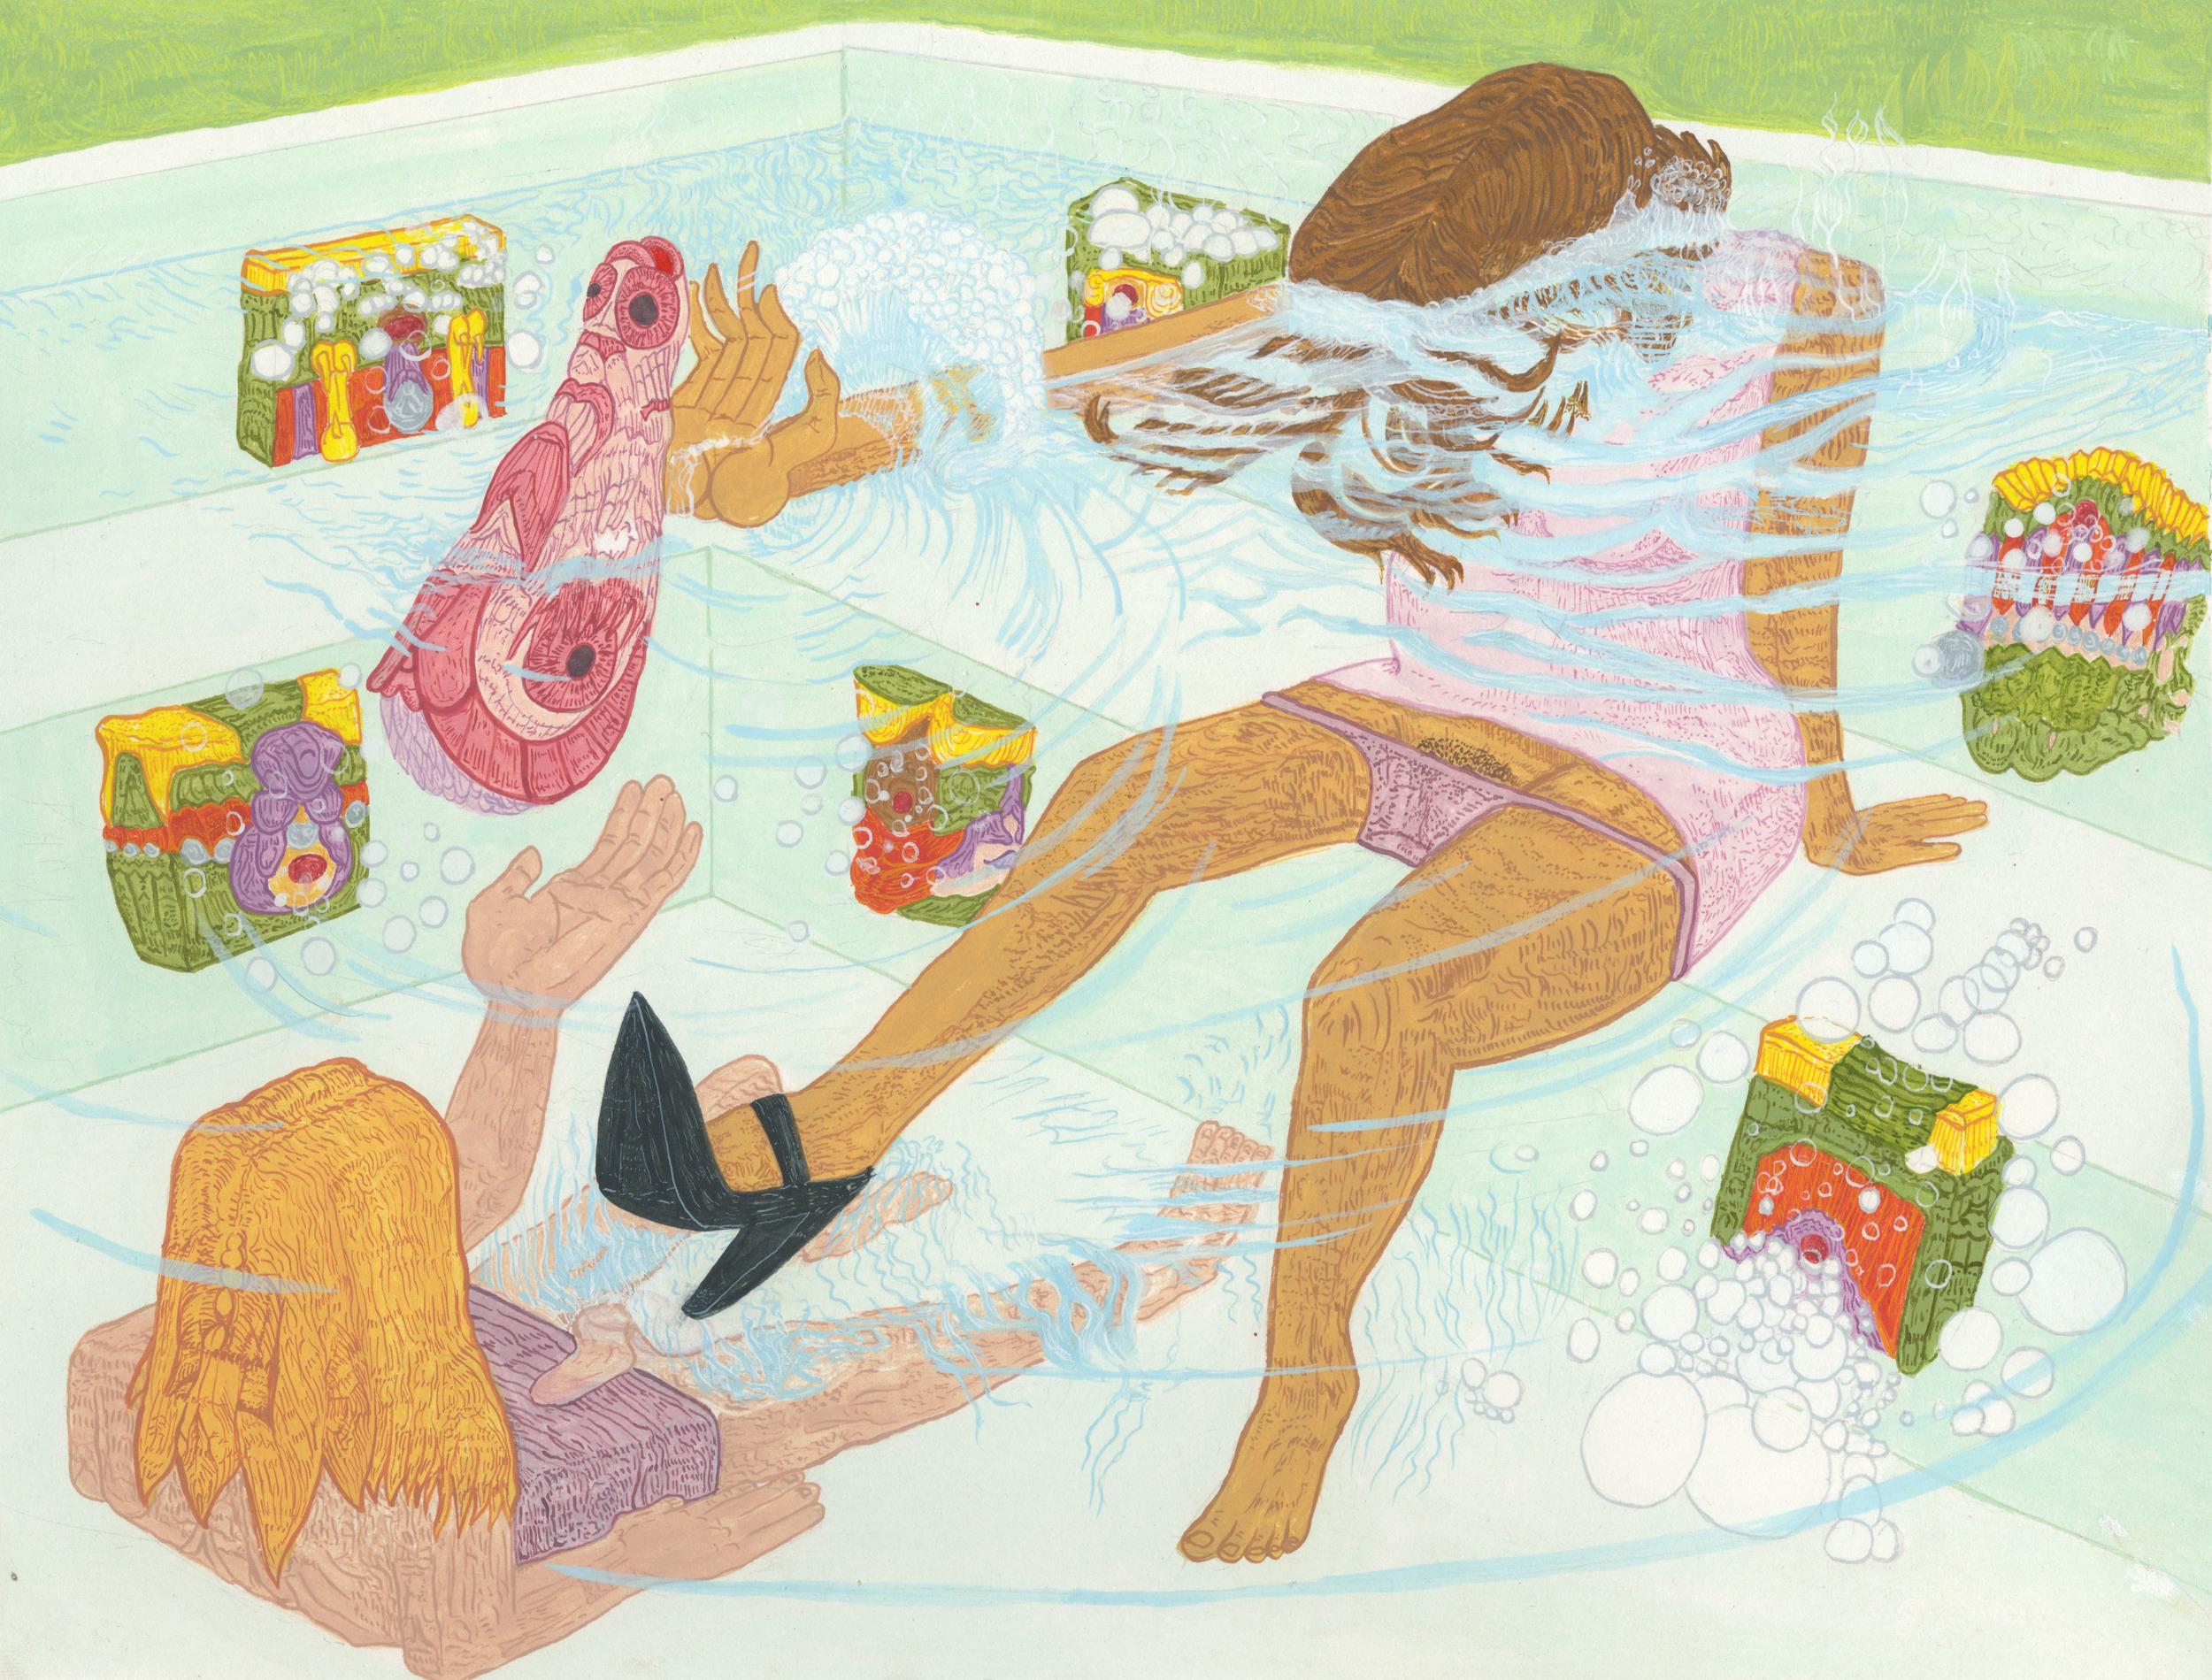 Bad Things Happen in Hotubs (The Eunuch Sent to Retrieve the Skin of Ereshkigal)